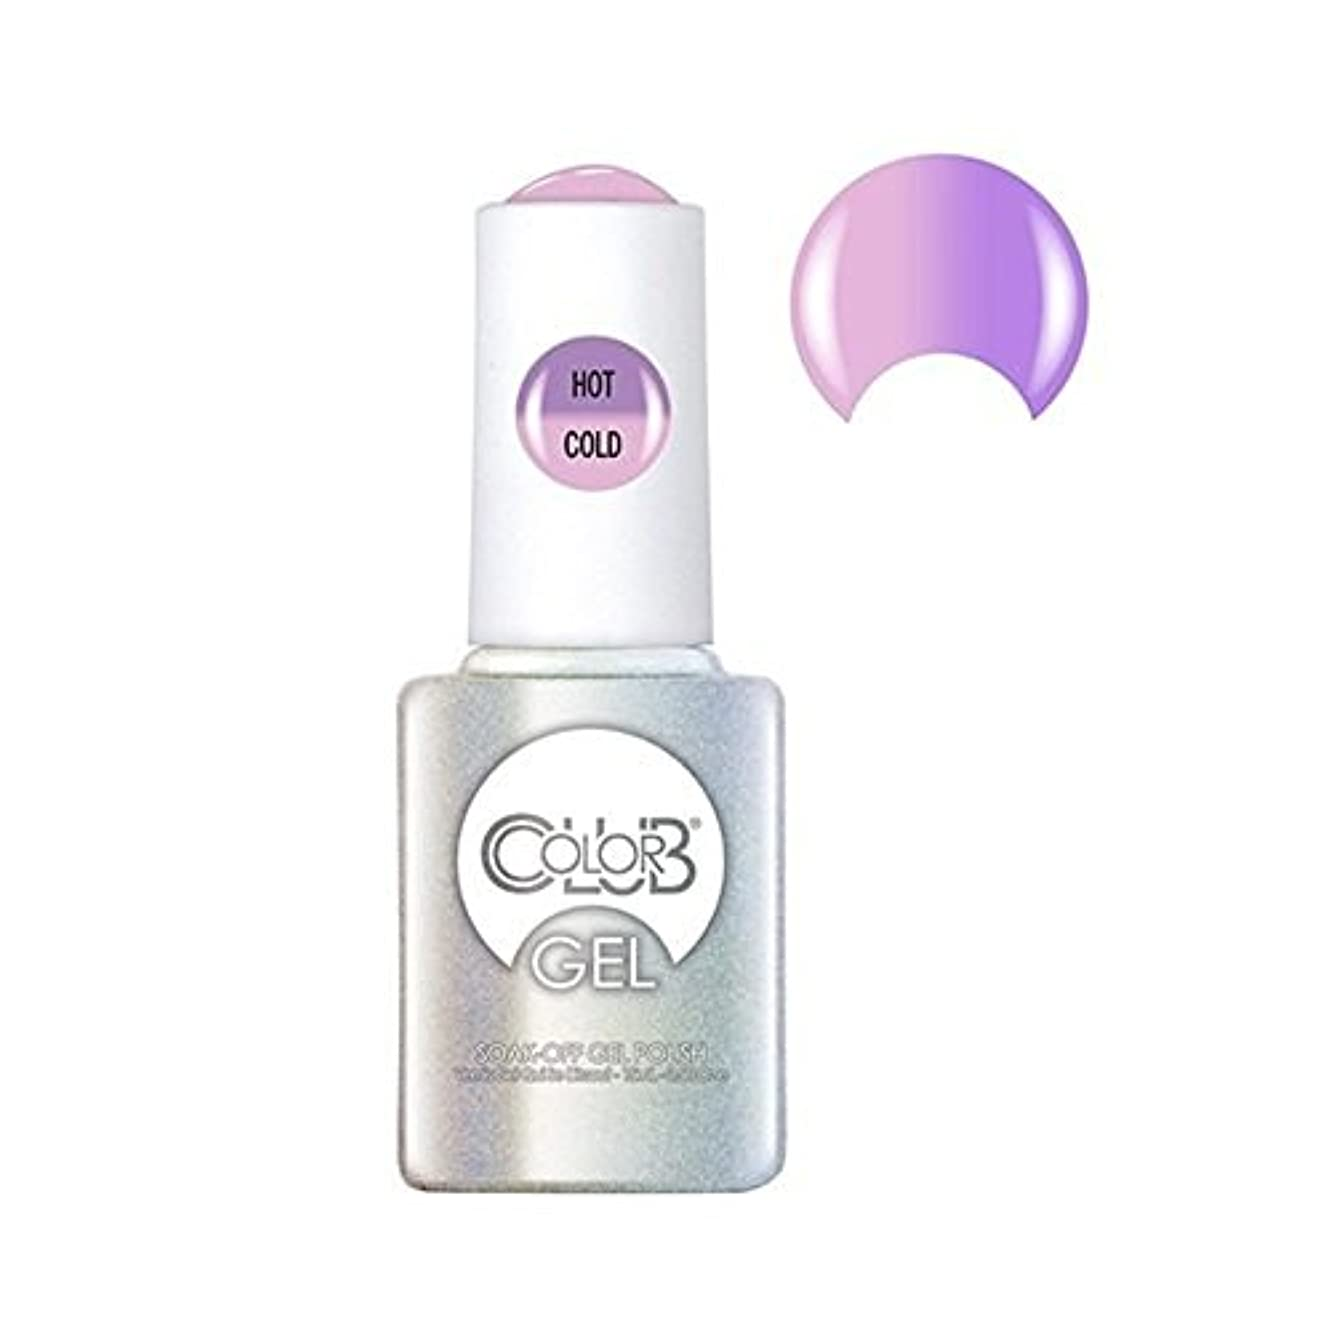 Color Club Gel Polish - Go with the Flow - 0.5oz / 15ml